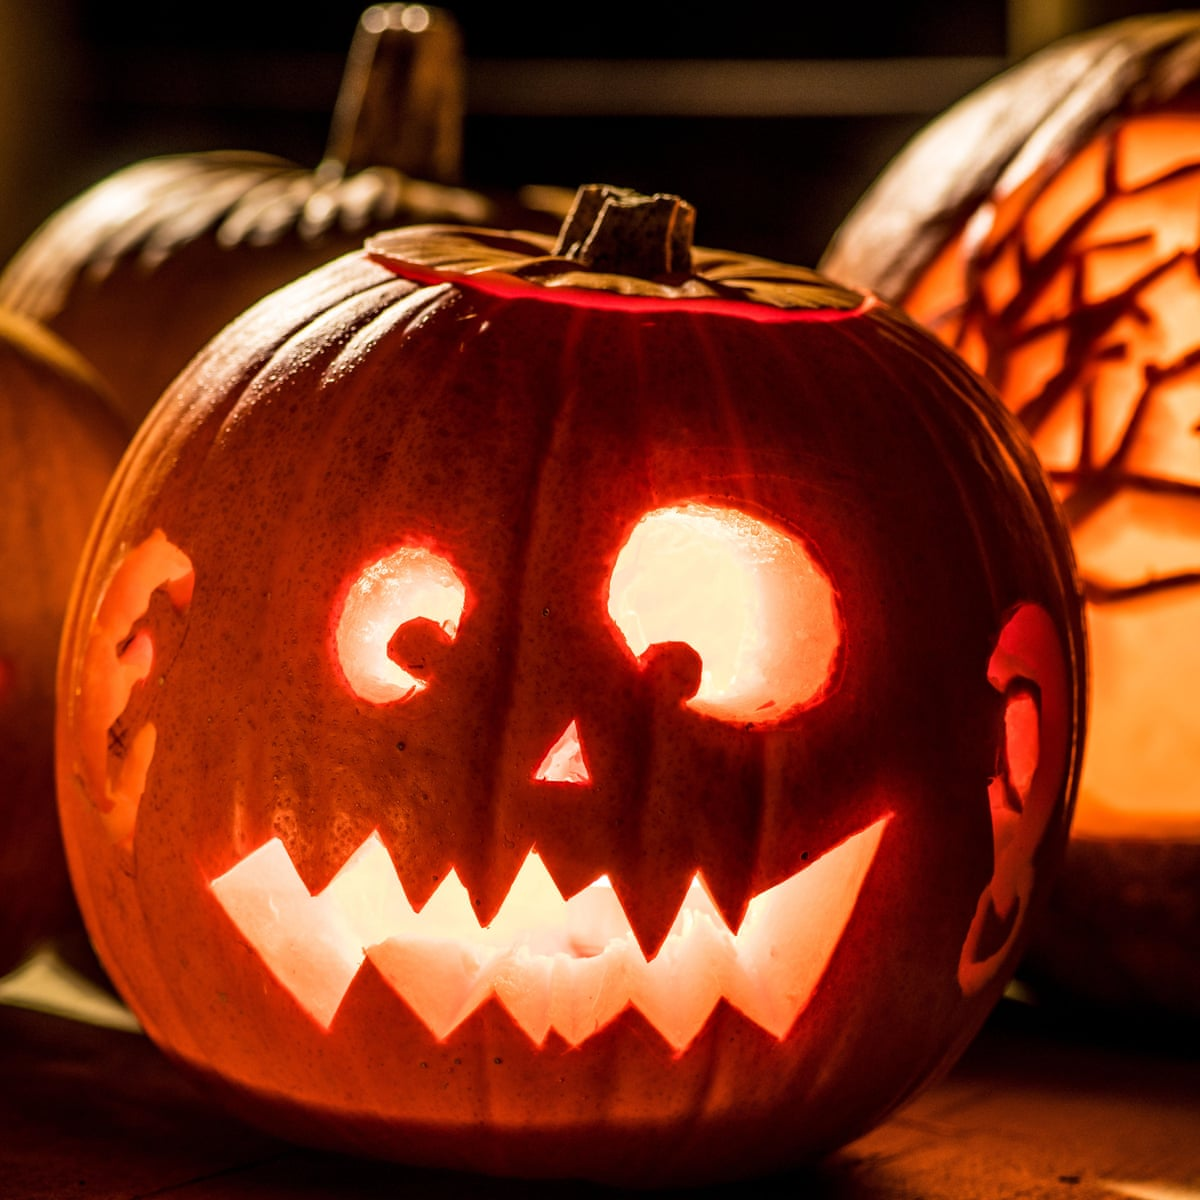 Over Half Uk S 24m Halloween Pumpkins Destined For Food Waste Food Waste The Guardian